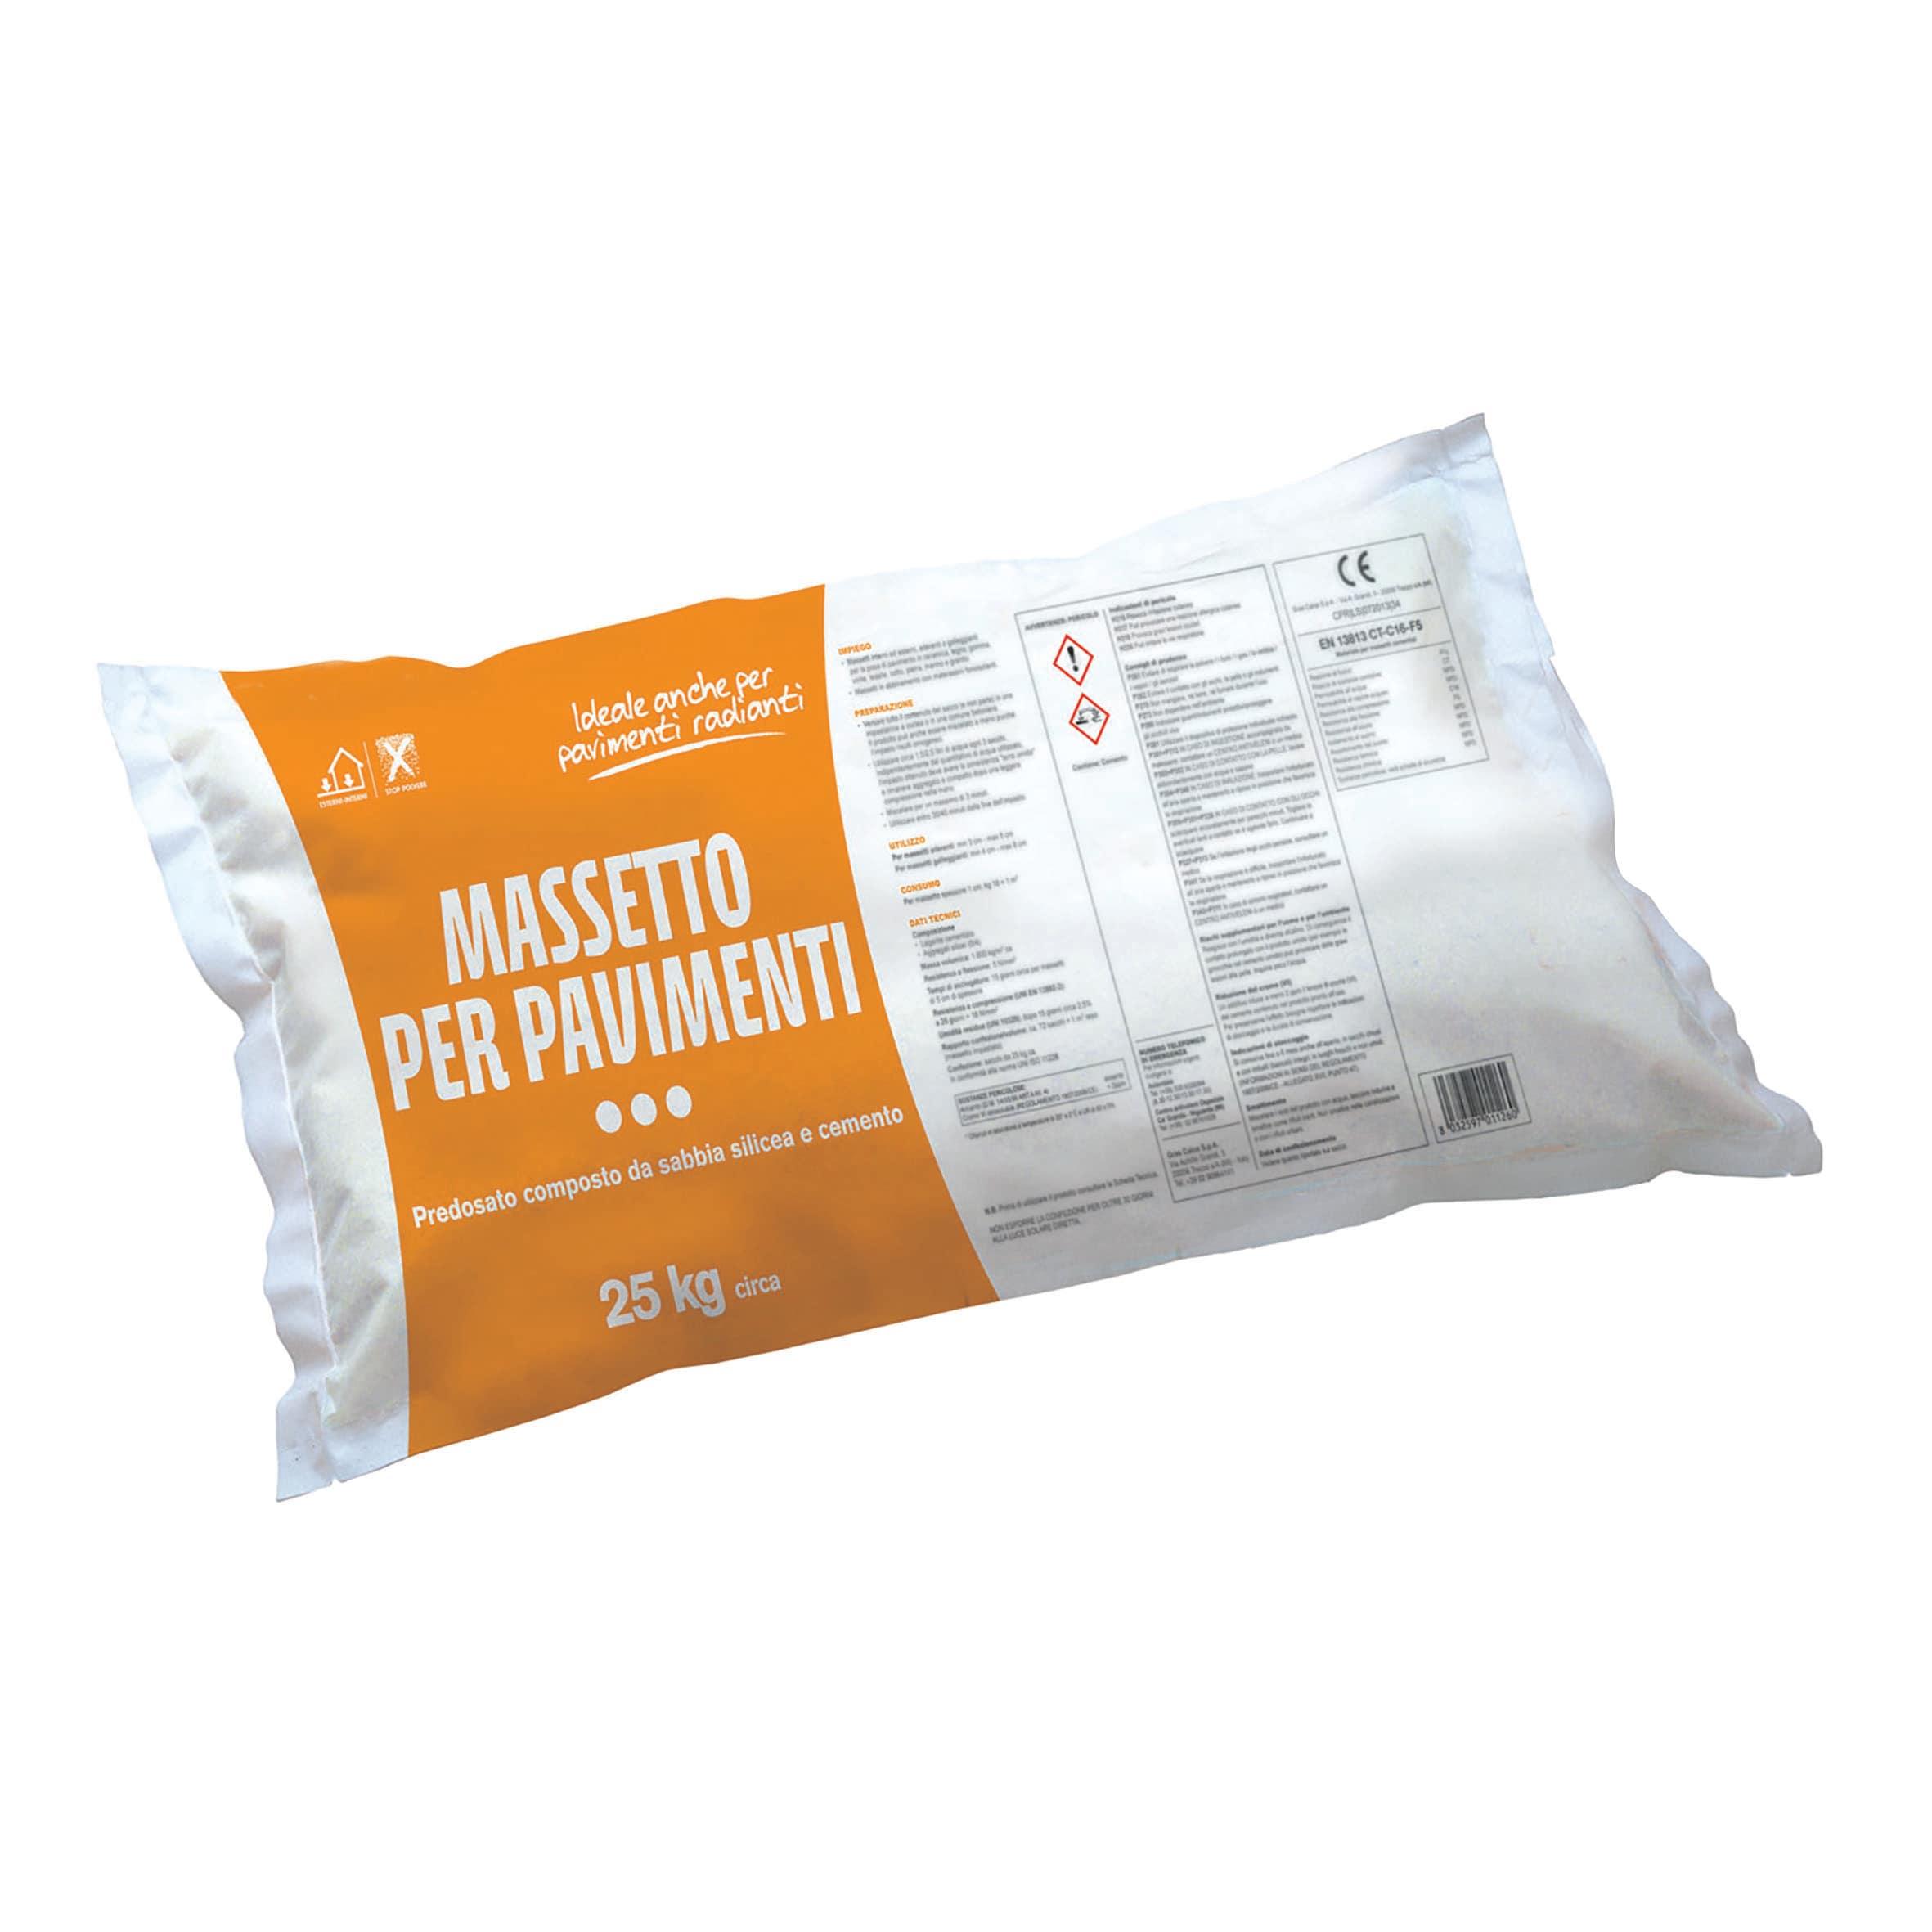 Massetto Per Pavimenti 25 Kg Prezzi E Offerte Online Leroy Merlin